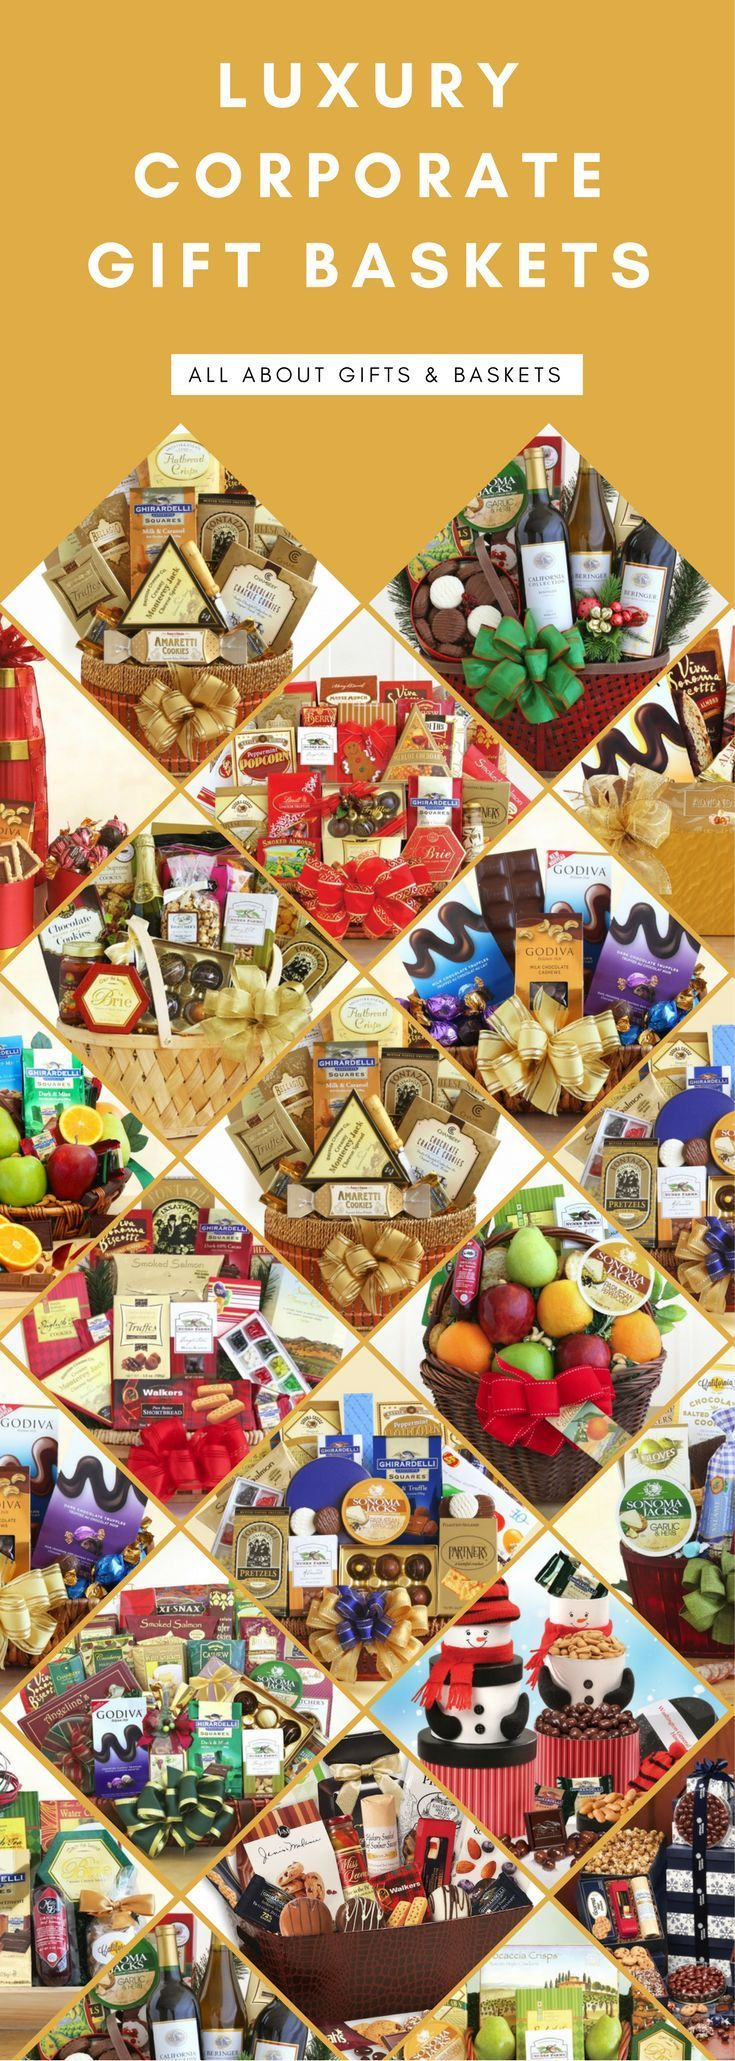 Corporate Gifts Ideas     Corporate Gifts Ideas     50+ Luxury Corporate Gift Ba...